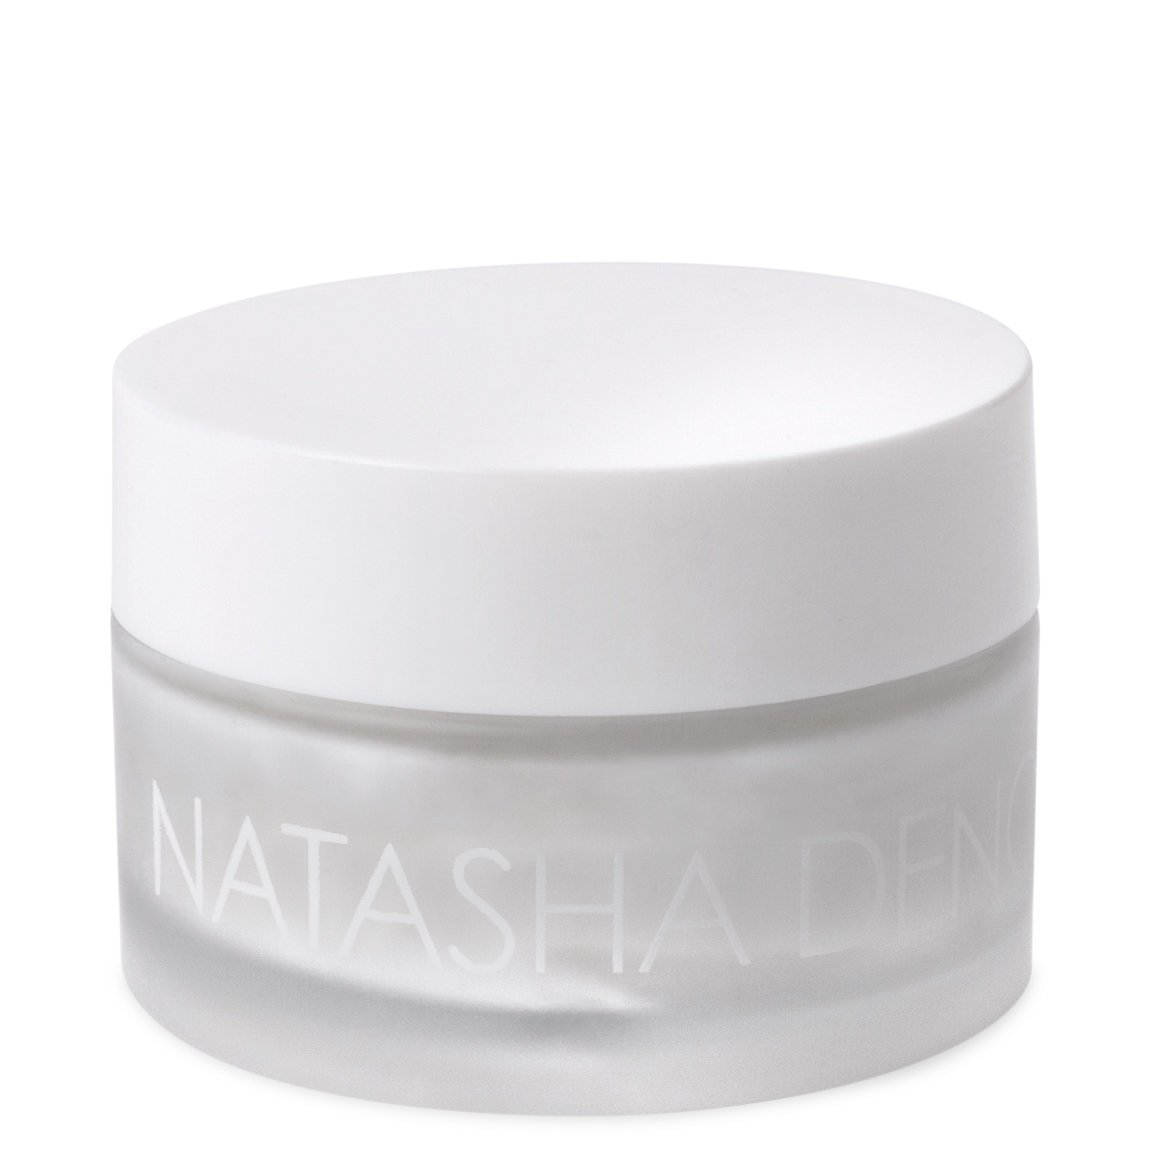 Natasha Denona Face Glow Primer Hydrating Underbase alternative view 1 - product swatch.